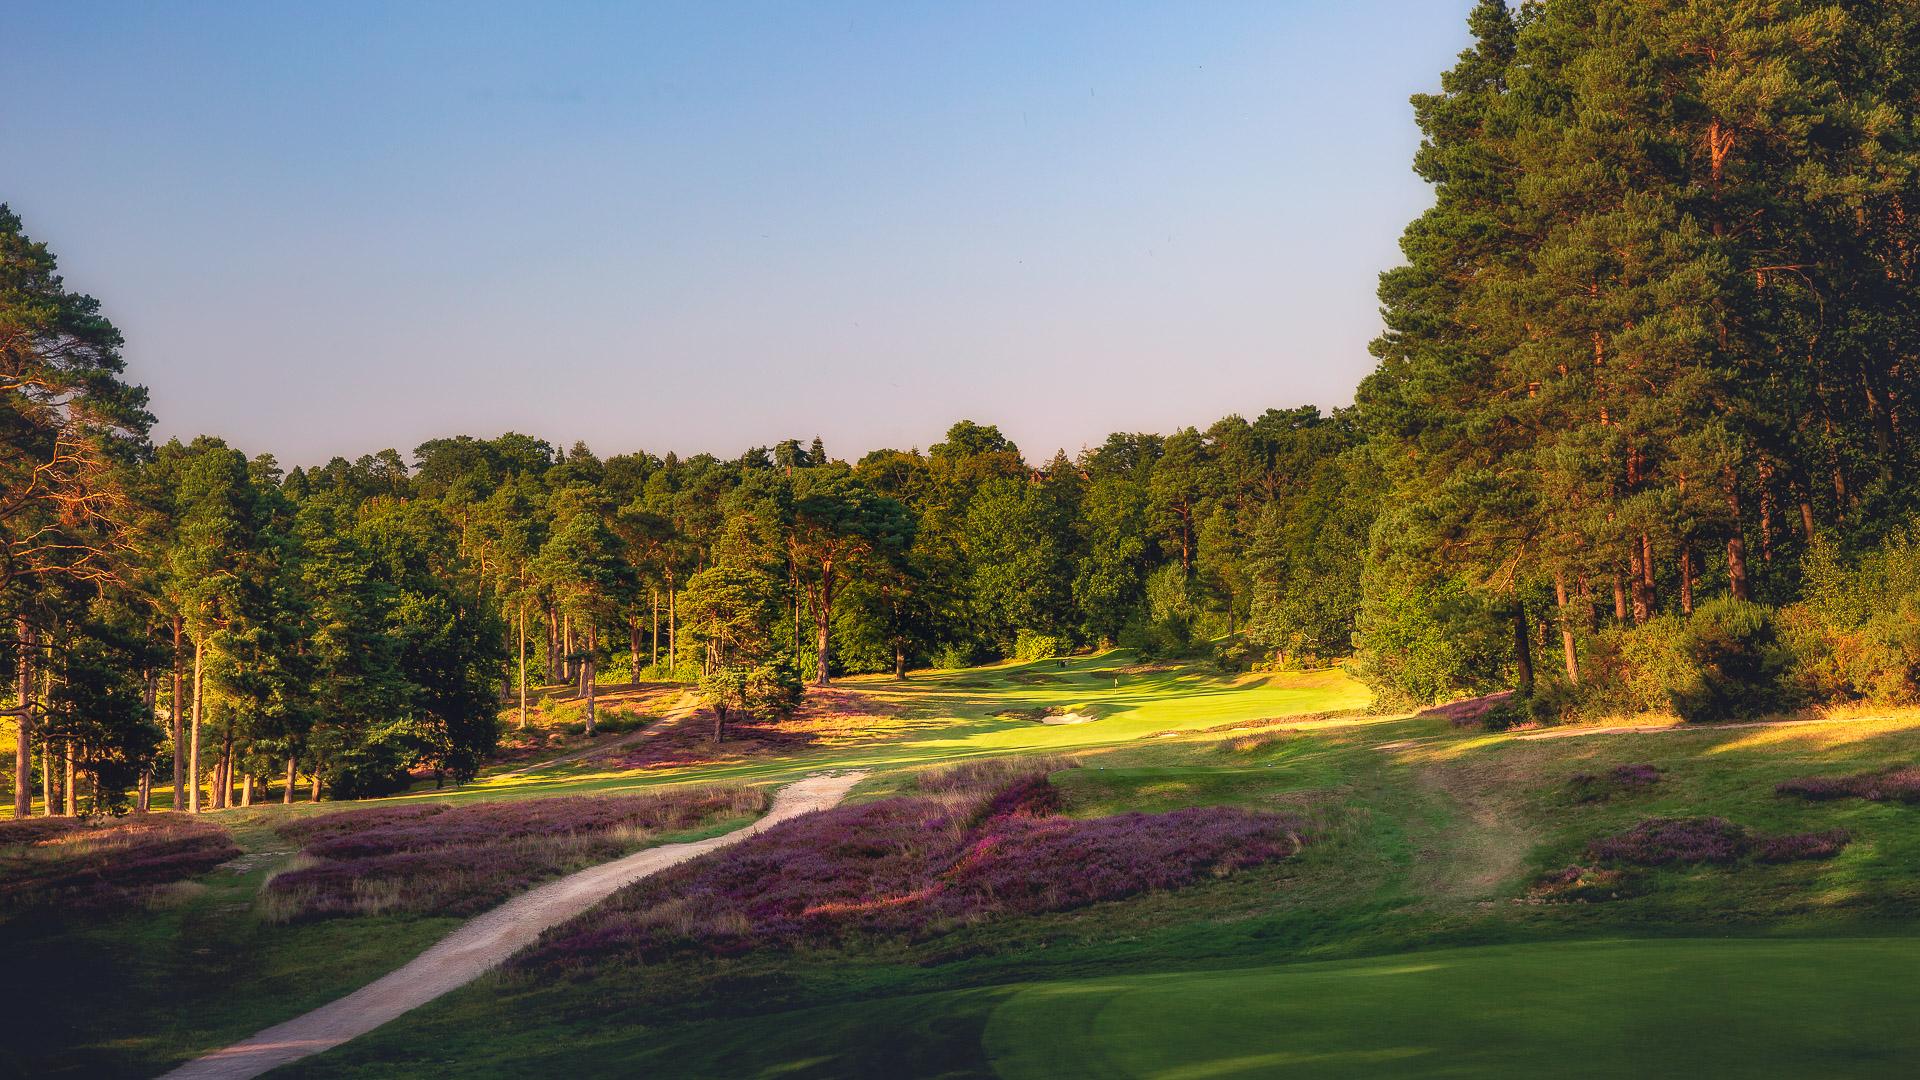 02nd-Hole-St-Georges-Hill-Golf-Club-2252-Edit-2